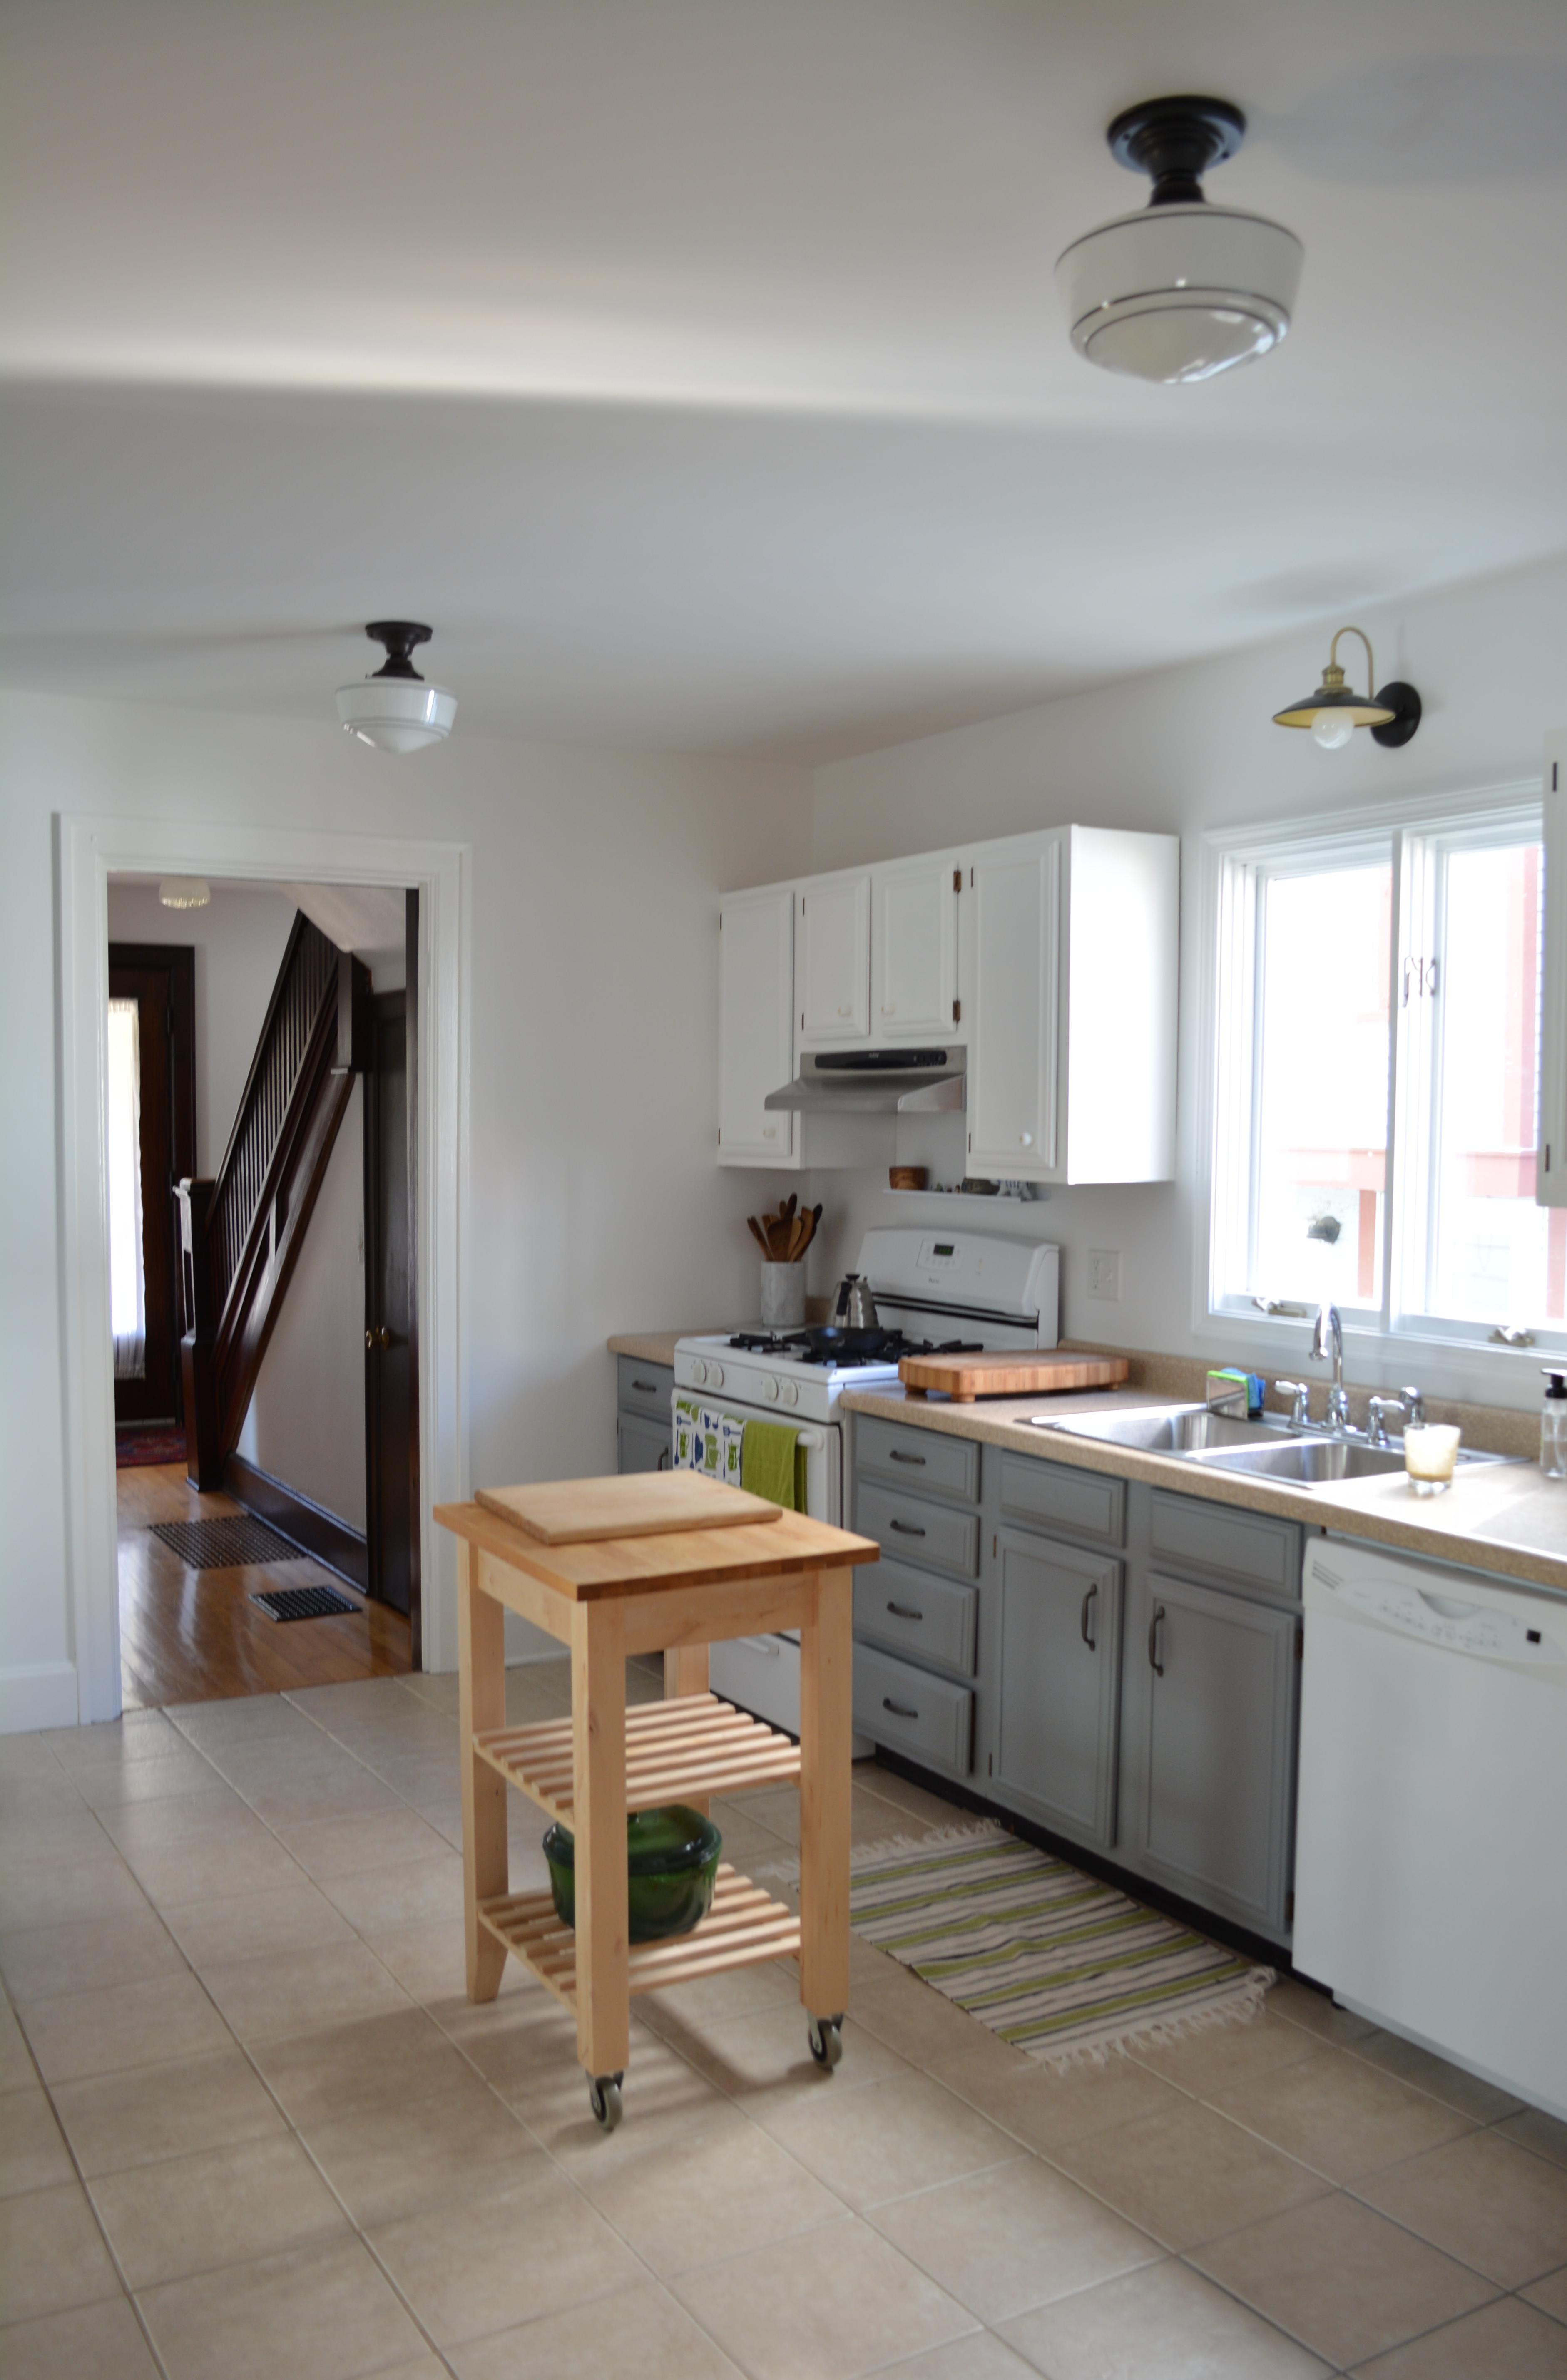 Kitchen Facelift Kitchen Facelift Complete Urban Cholita